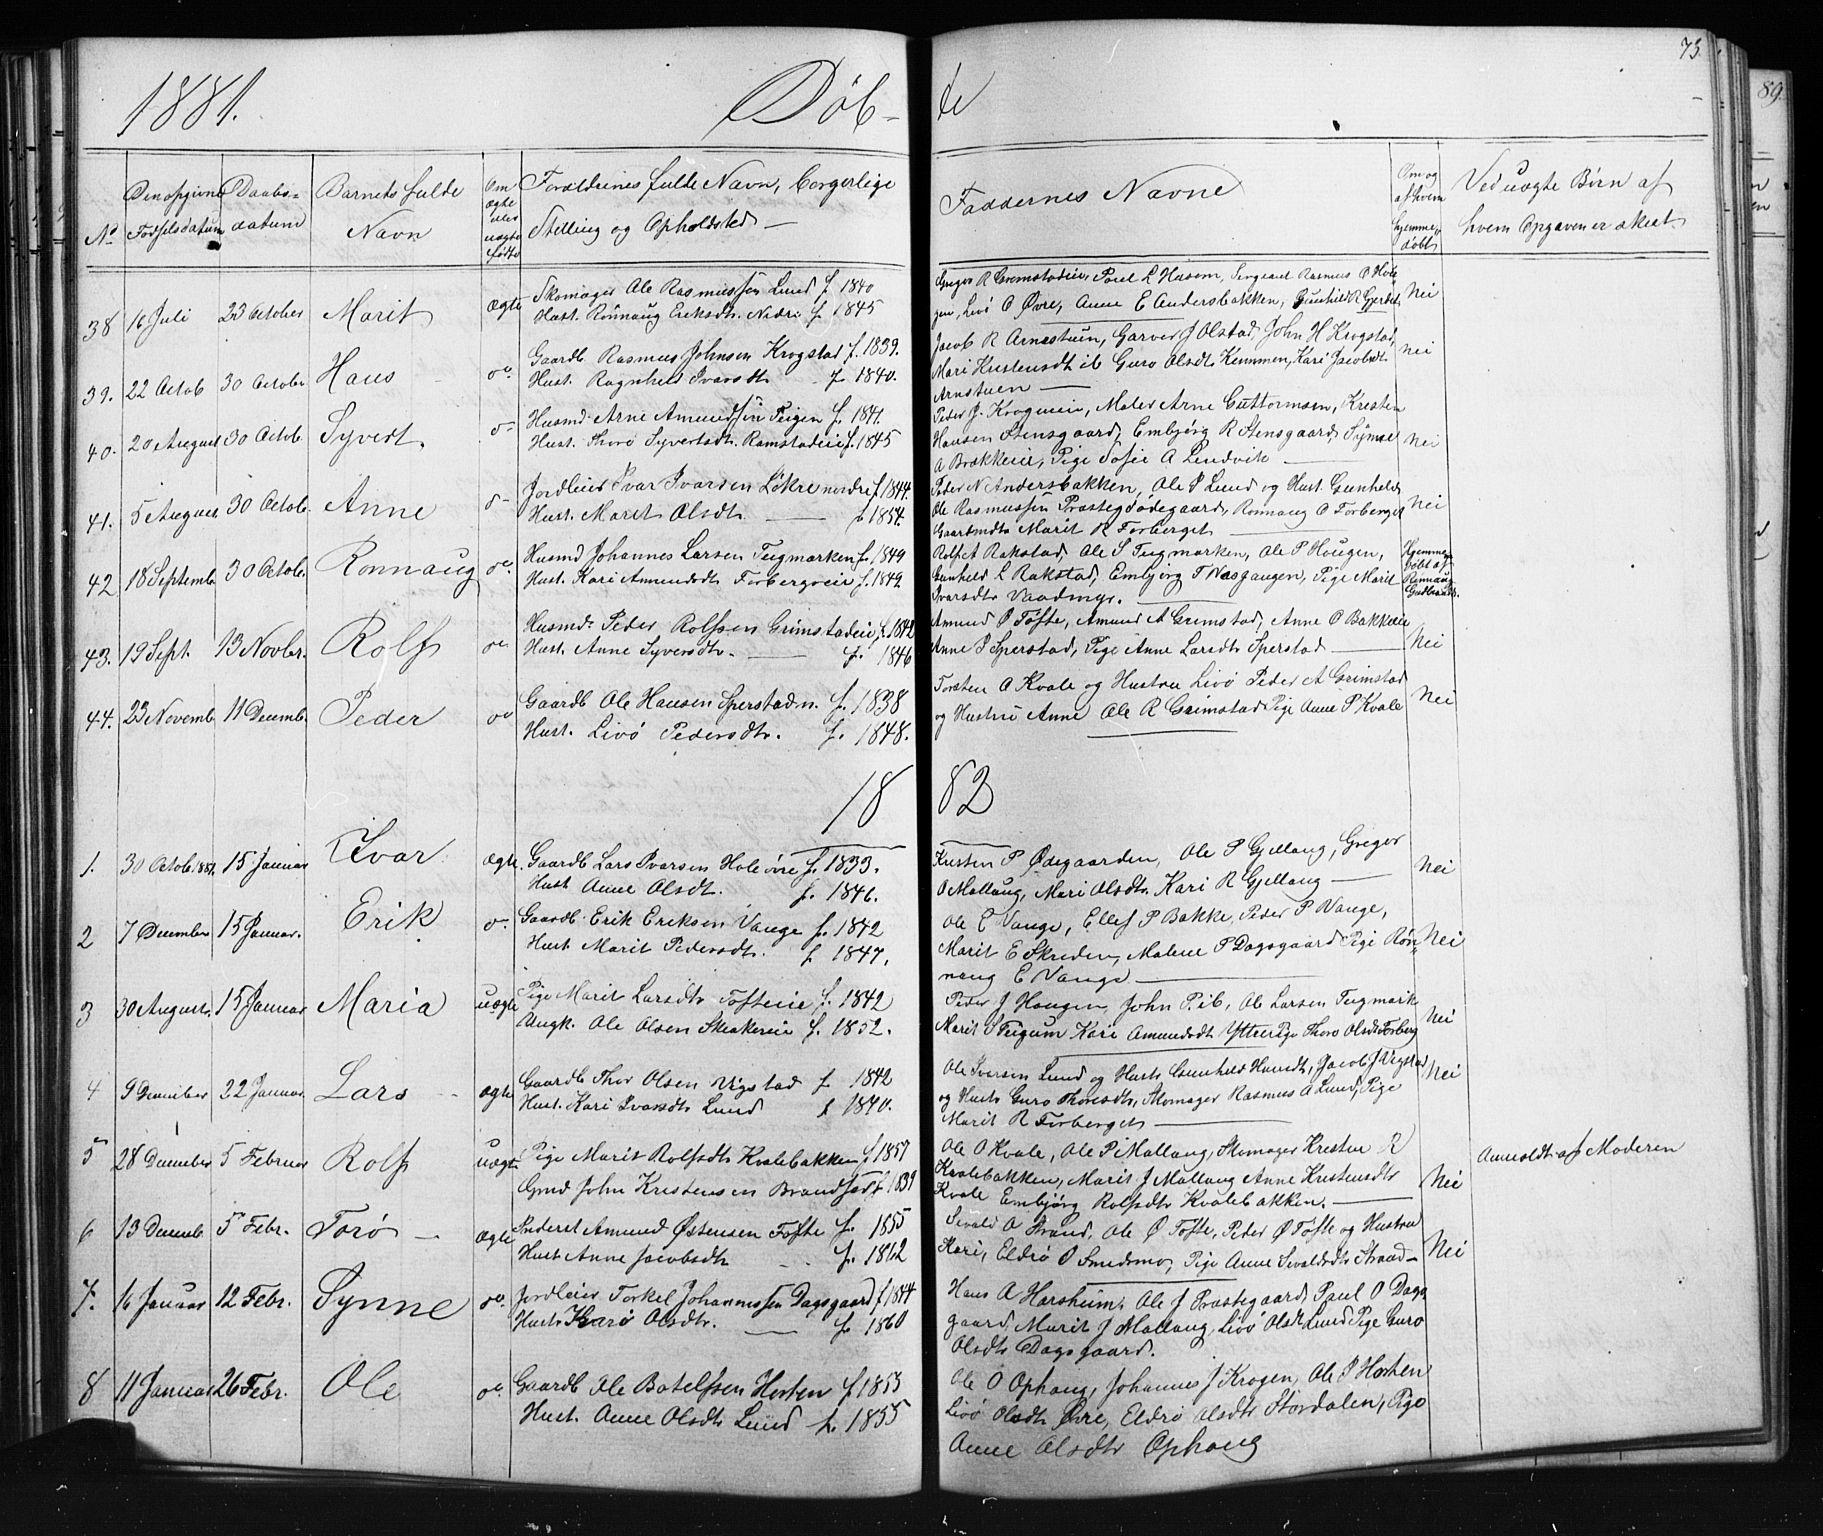 SAH, Skjåk prestekontor, Klokkerbok nr. 1, 1865-1893, s. 73